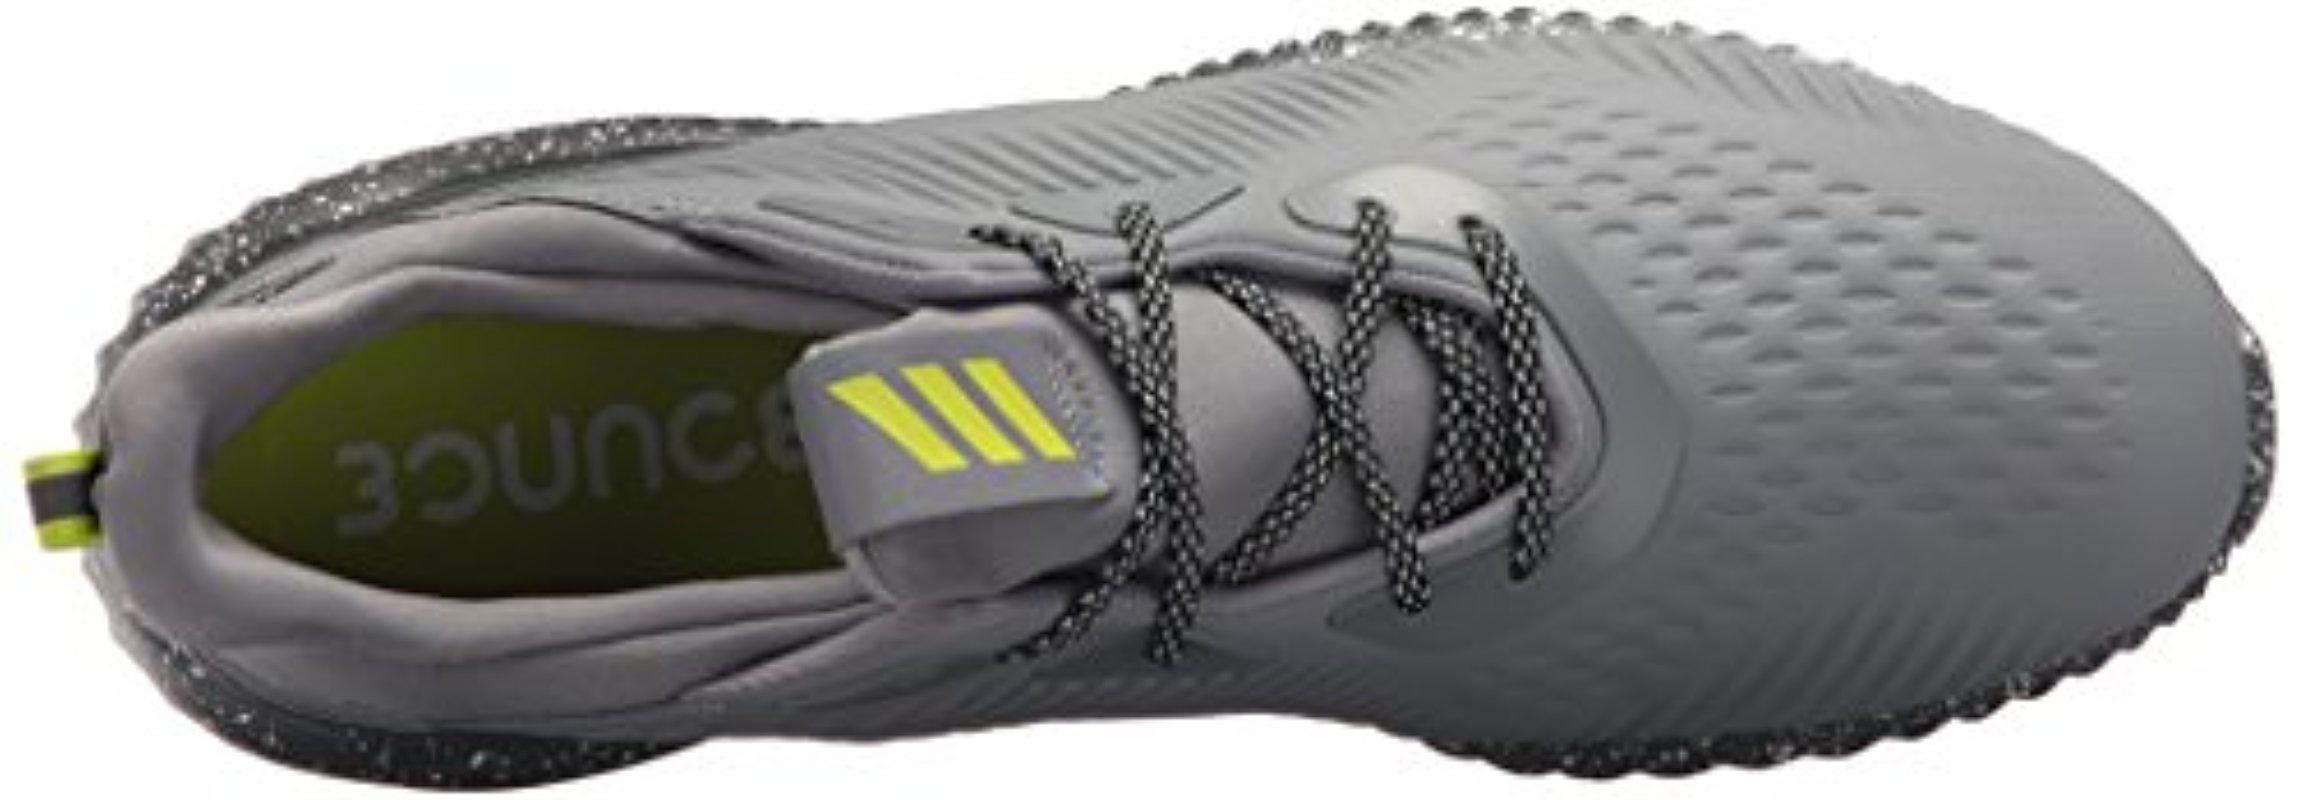 53eaea303 Adidas - Gray Alphabounce Em Ctd Running Shoe for Men - Lyst. View  fullscreen